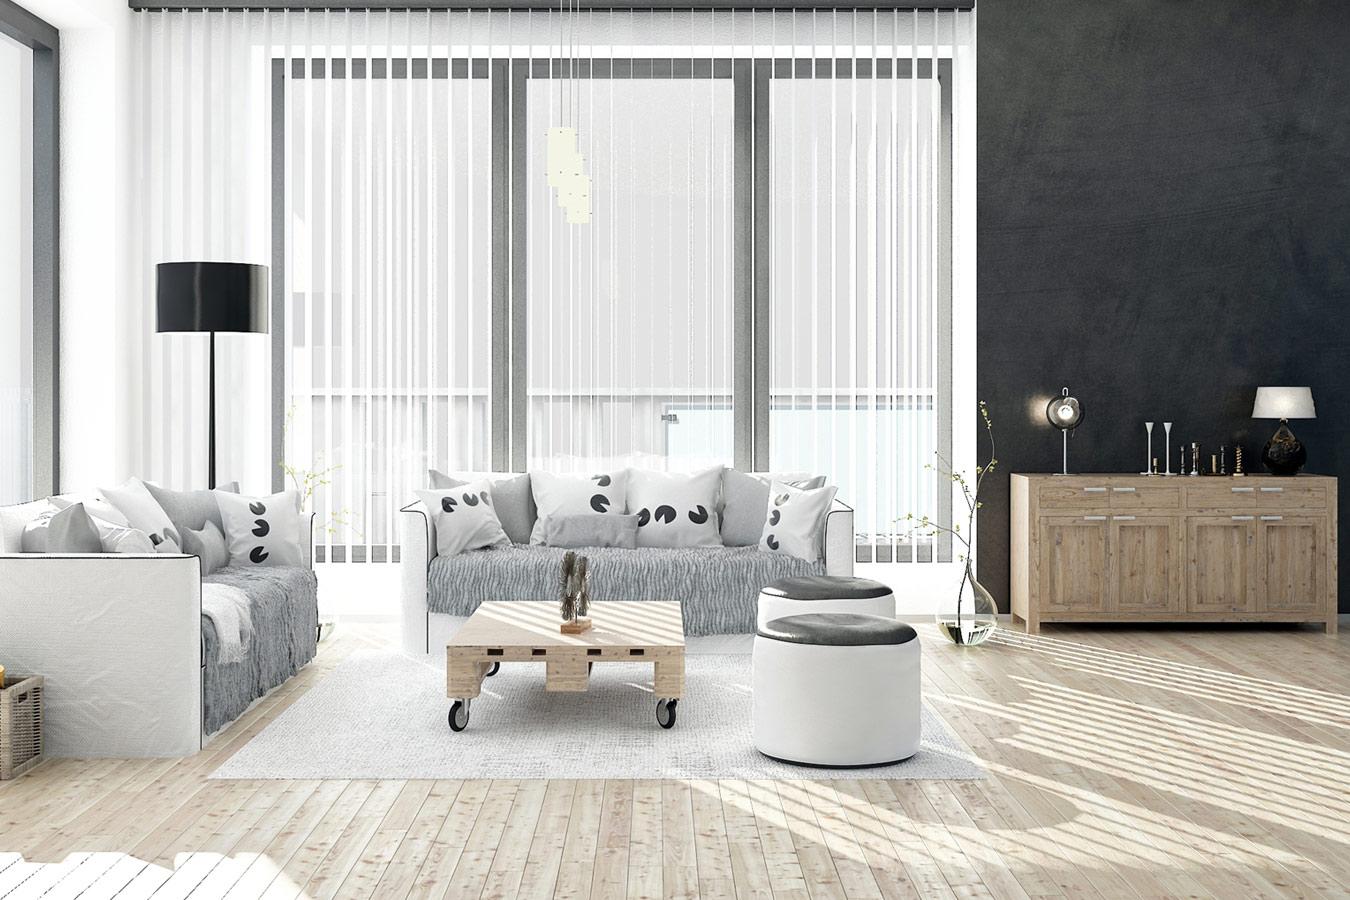 http://www.interieurdesigner.be/frontend/files/userfiles/images/interieurtips/Verftechnieken/structuur.jpg